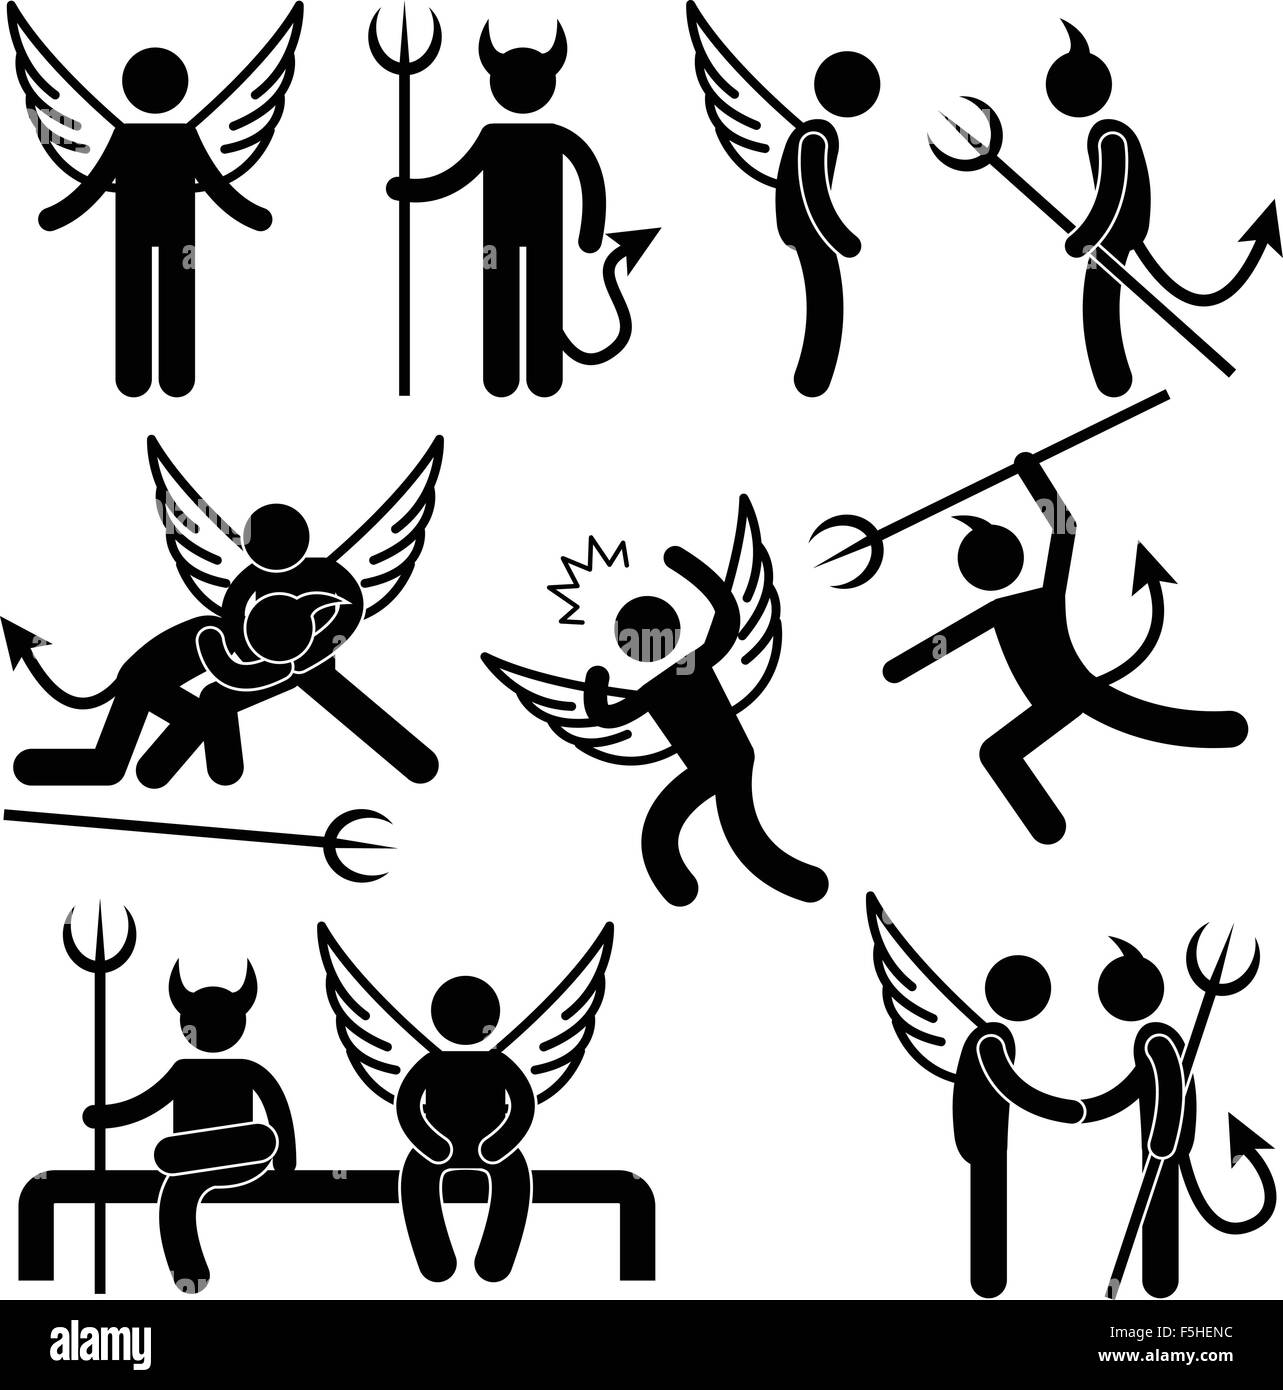 Devil Angel Friend Enemy Icon Symbol Sign Pictogram - Stock Image